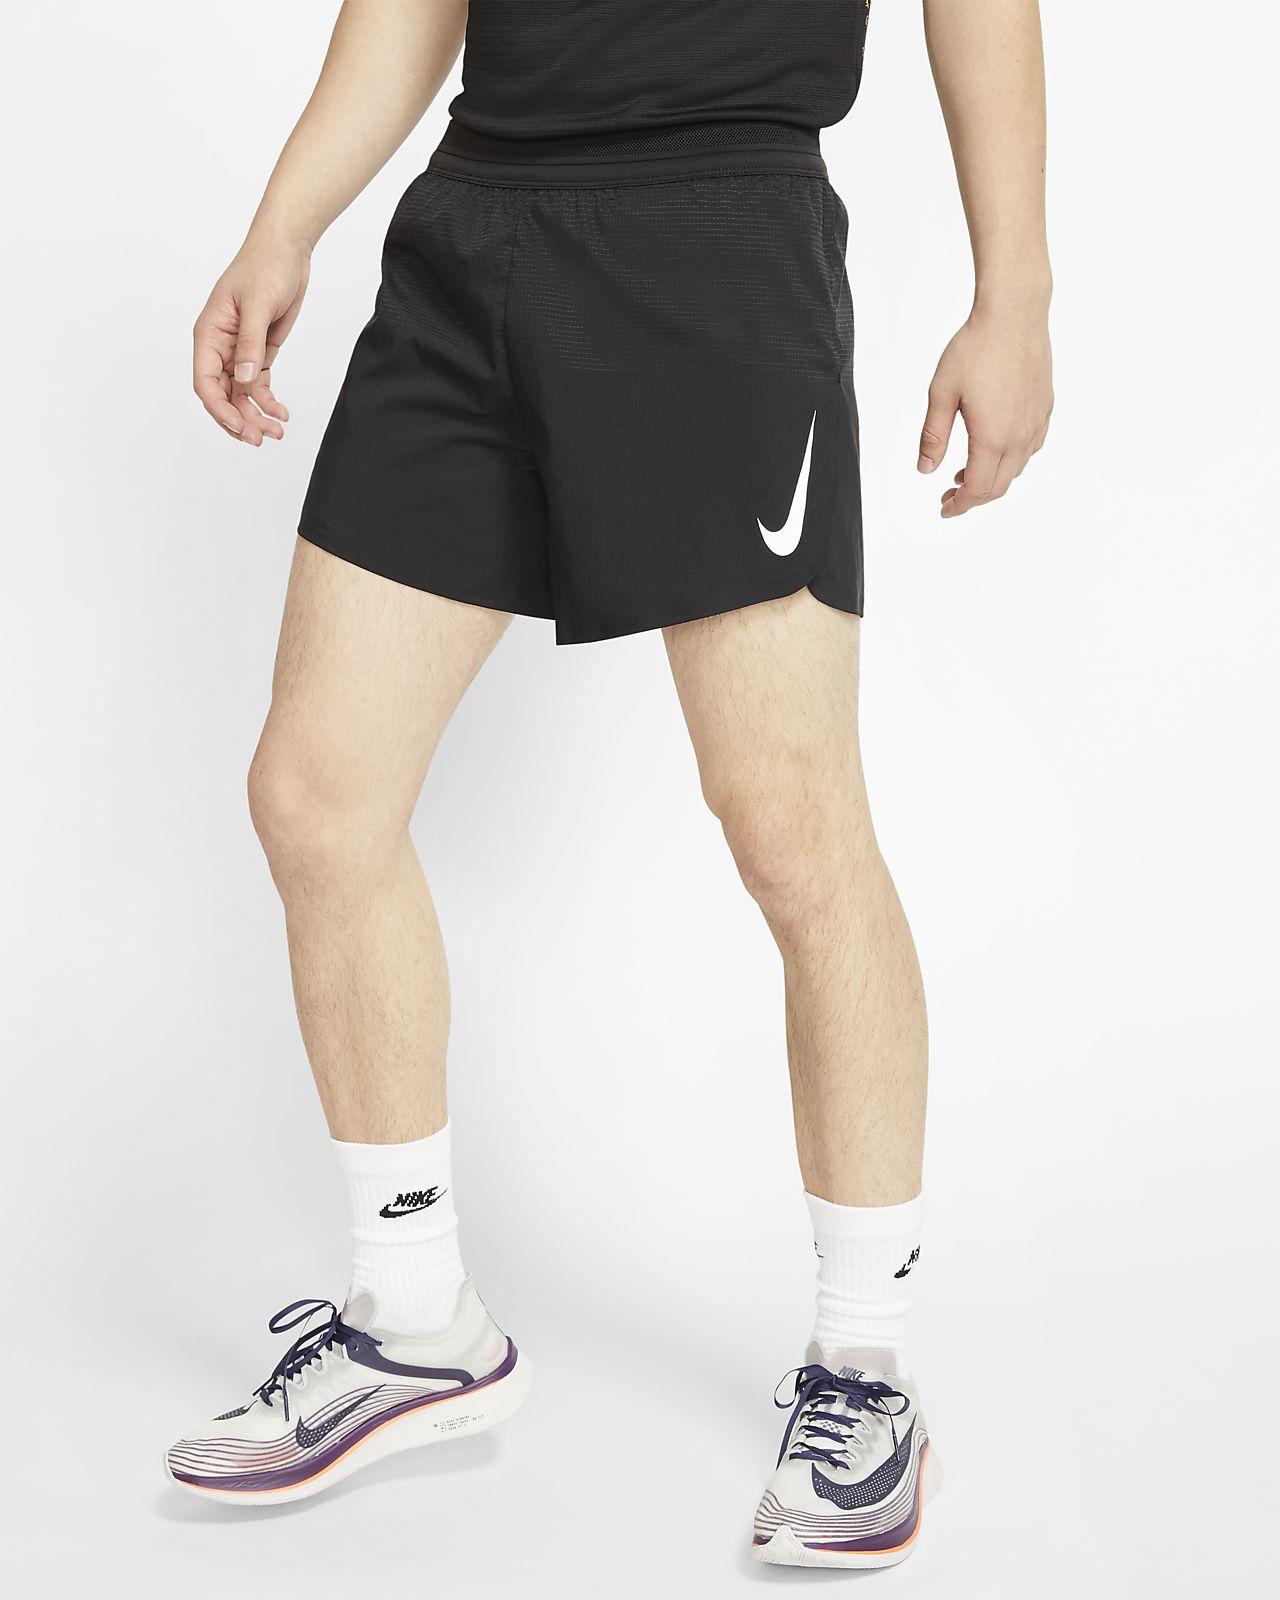 nike shorts running mens